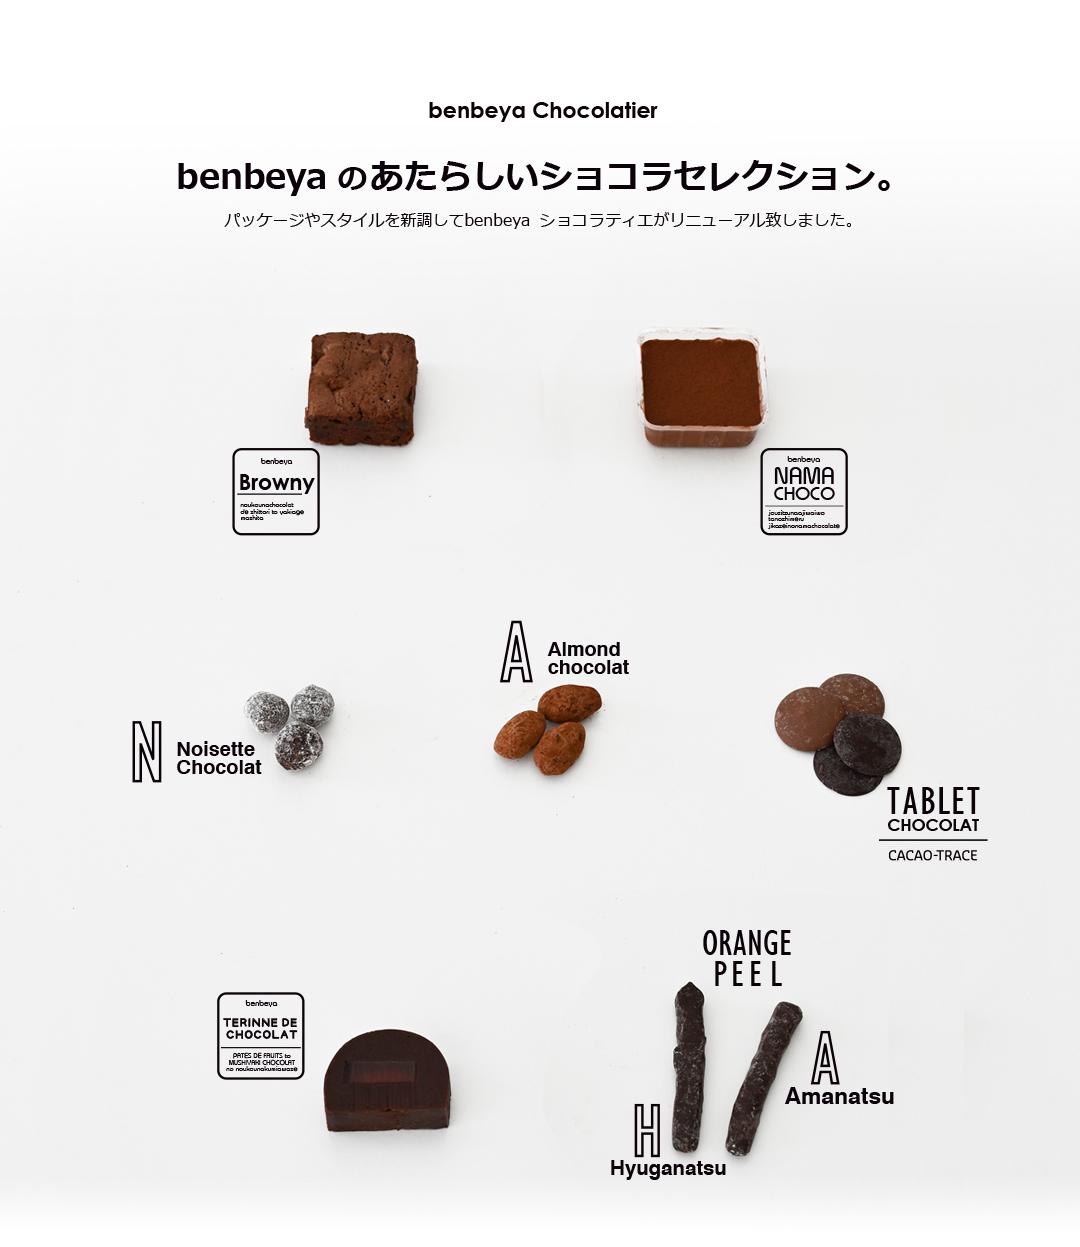 benbeya  のショコラティエラインナップ